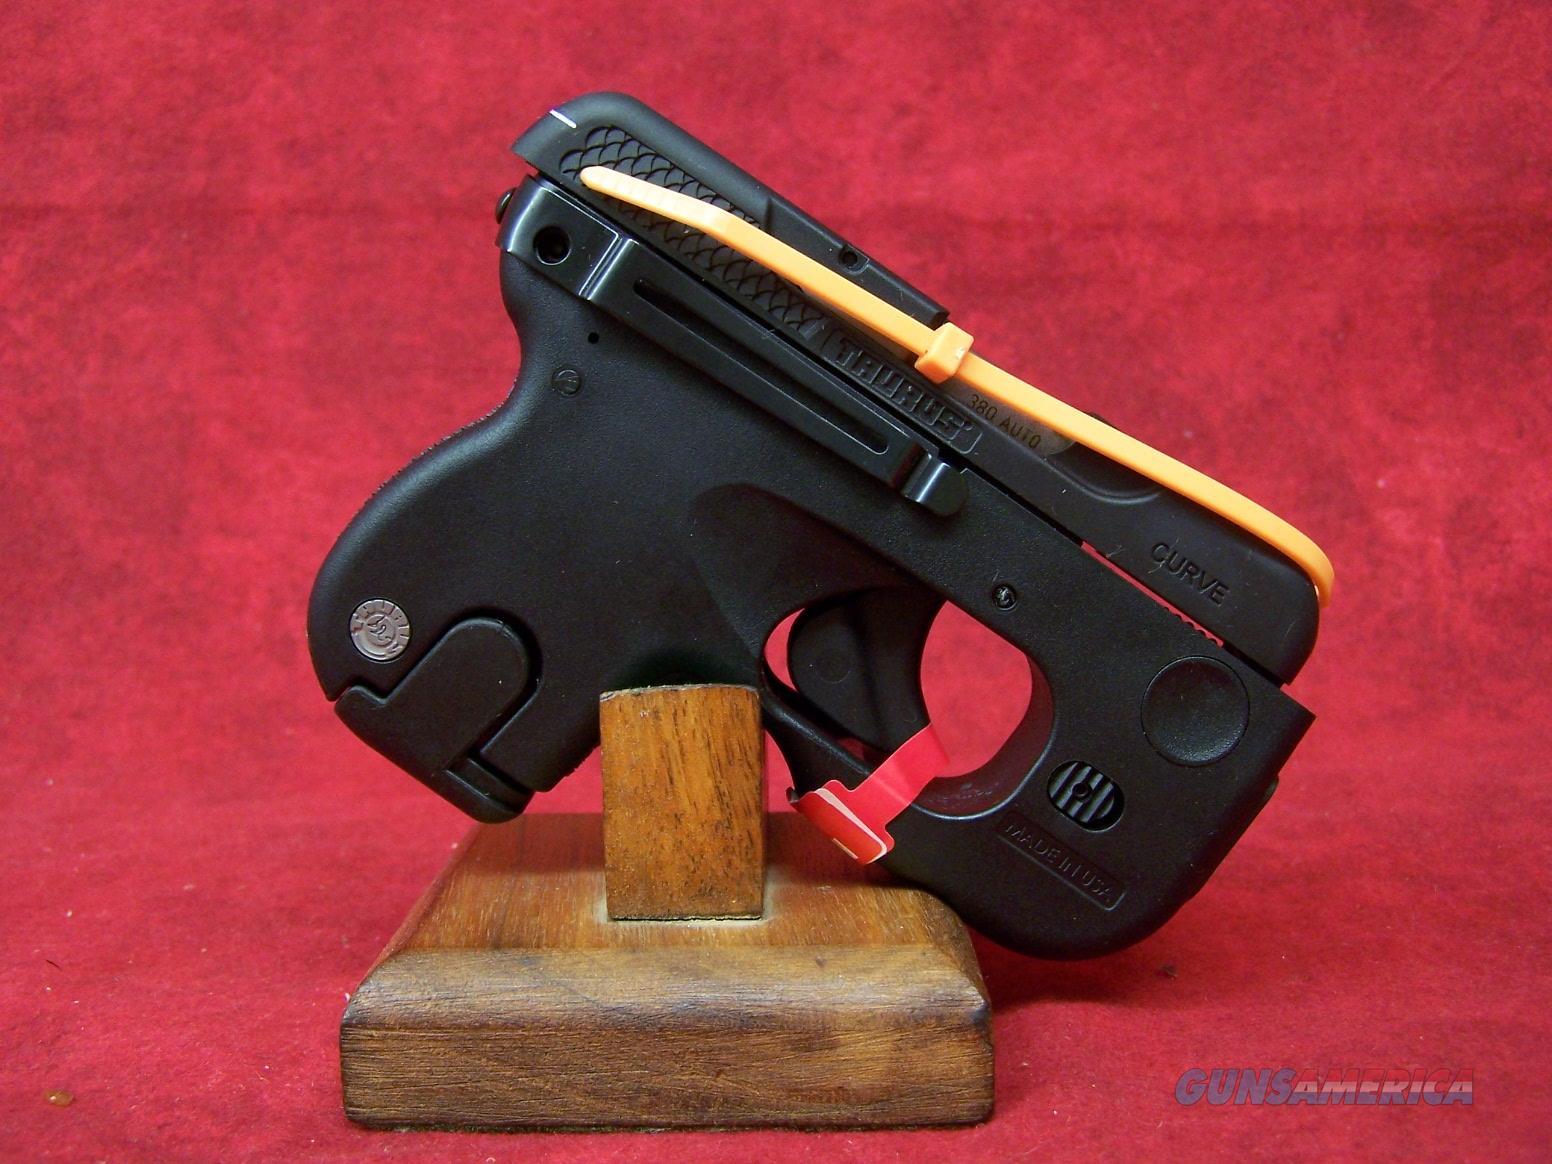 Taurus Curve With Laser .380 ACP 2.5 Inch Barrel Black Oxide Finish Six Round (1-180031l) Model 180   Guns > Pistols > Taurus Pistols > Semi Auto Pistols > Polymer Frame